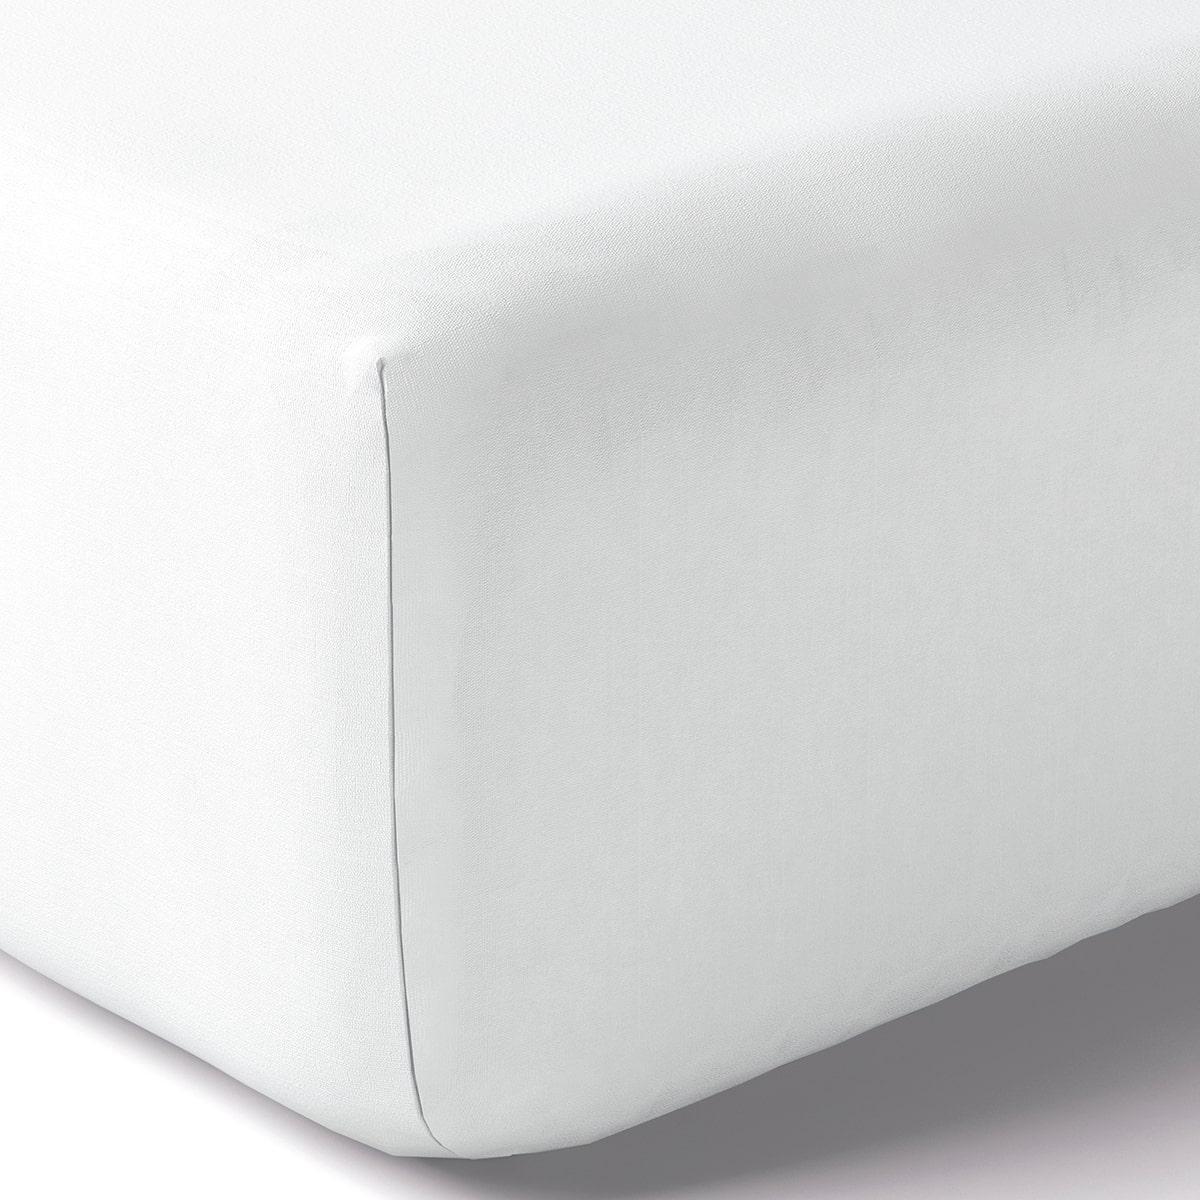 Drap housse coton 80x190 cm blanc